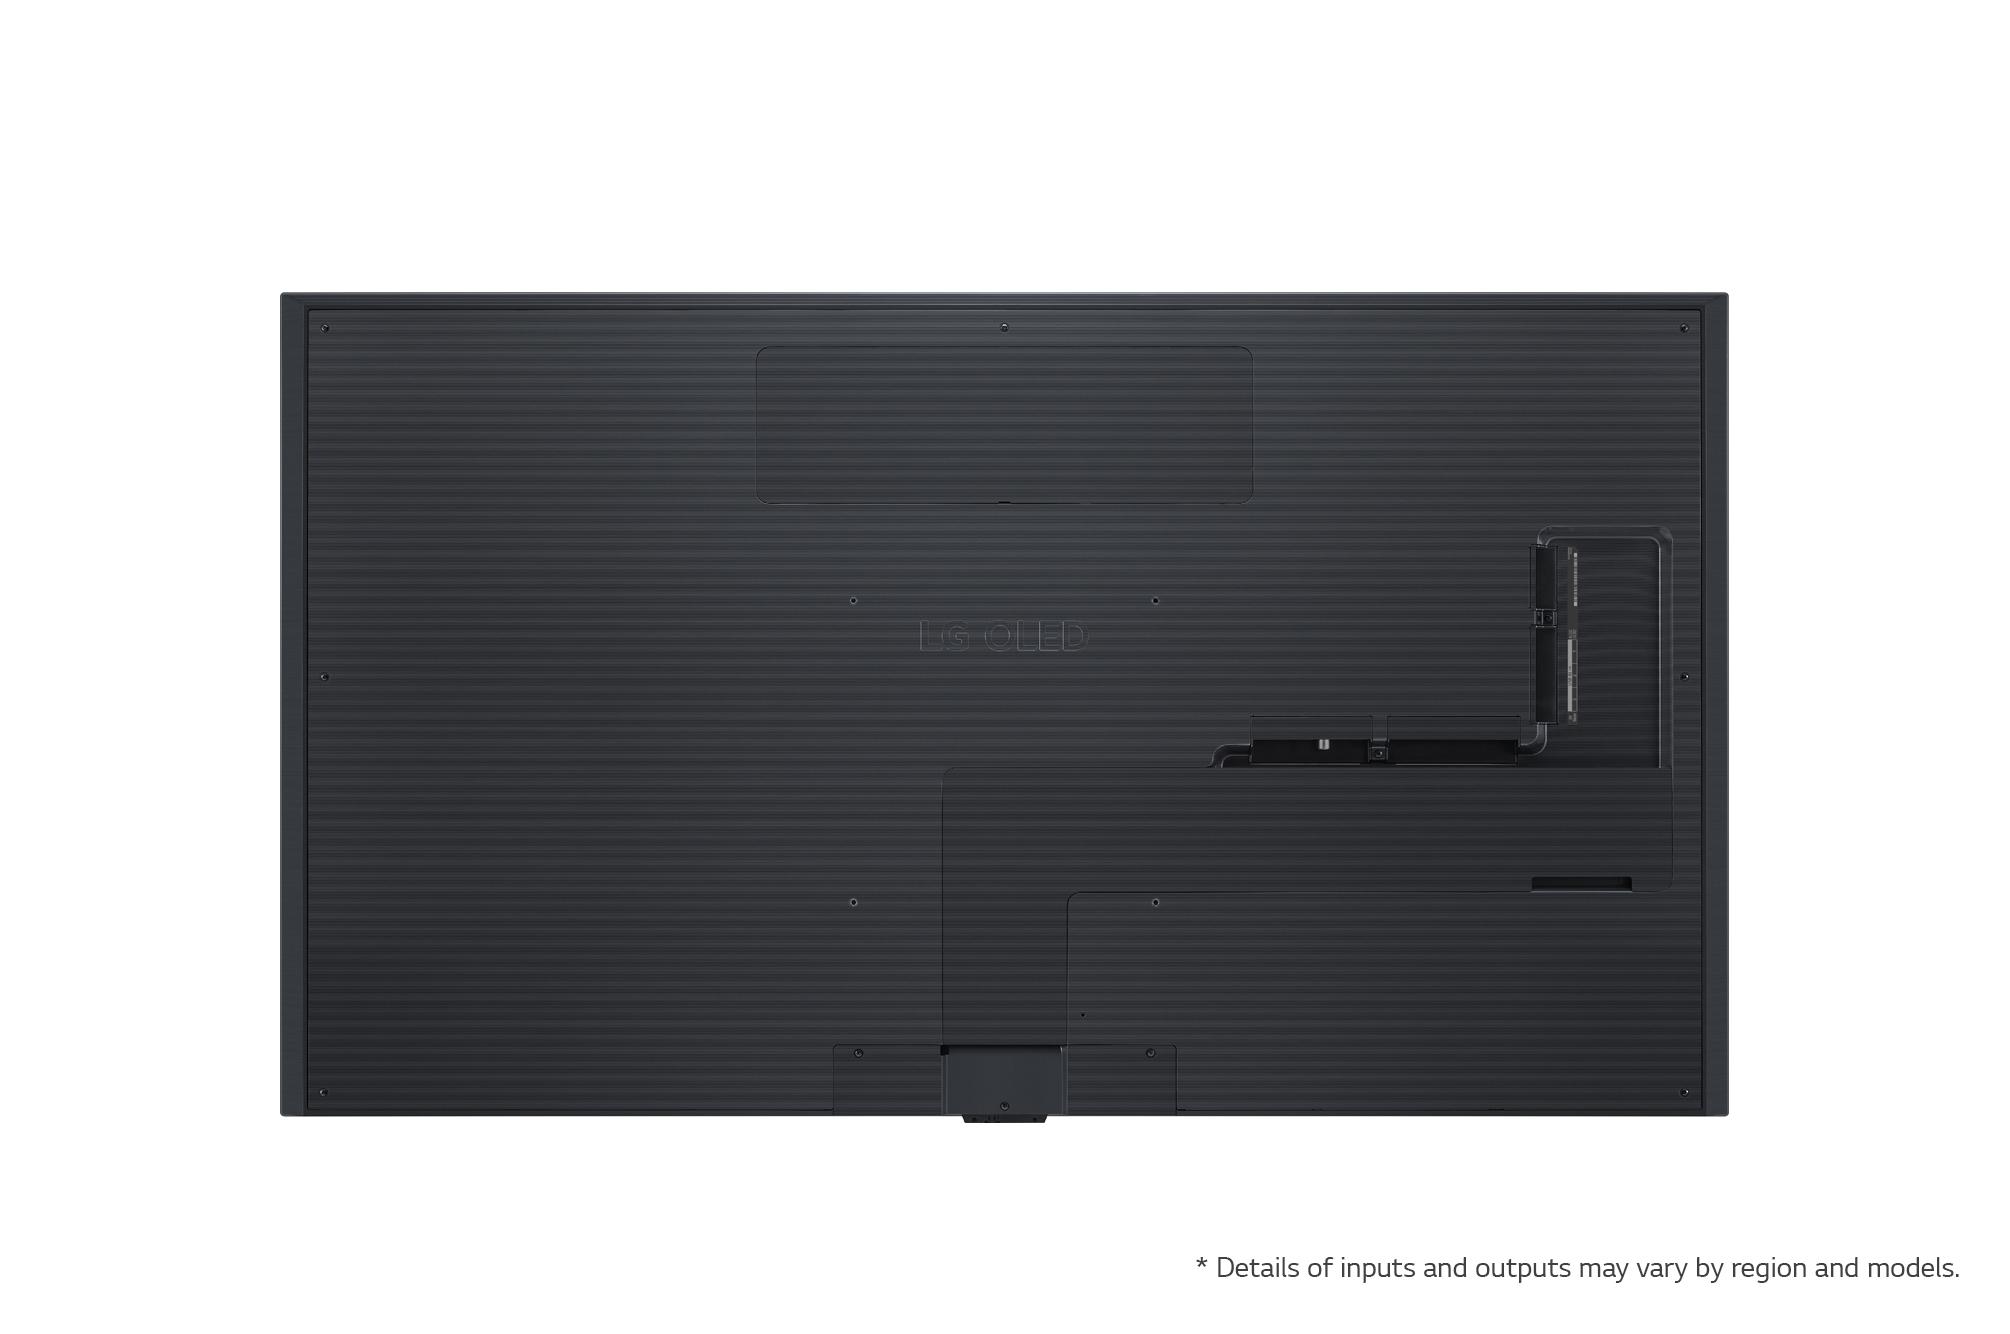 LG Pro:Centric SMART 65WS960H (EU) 7